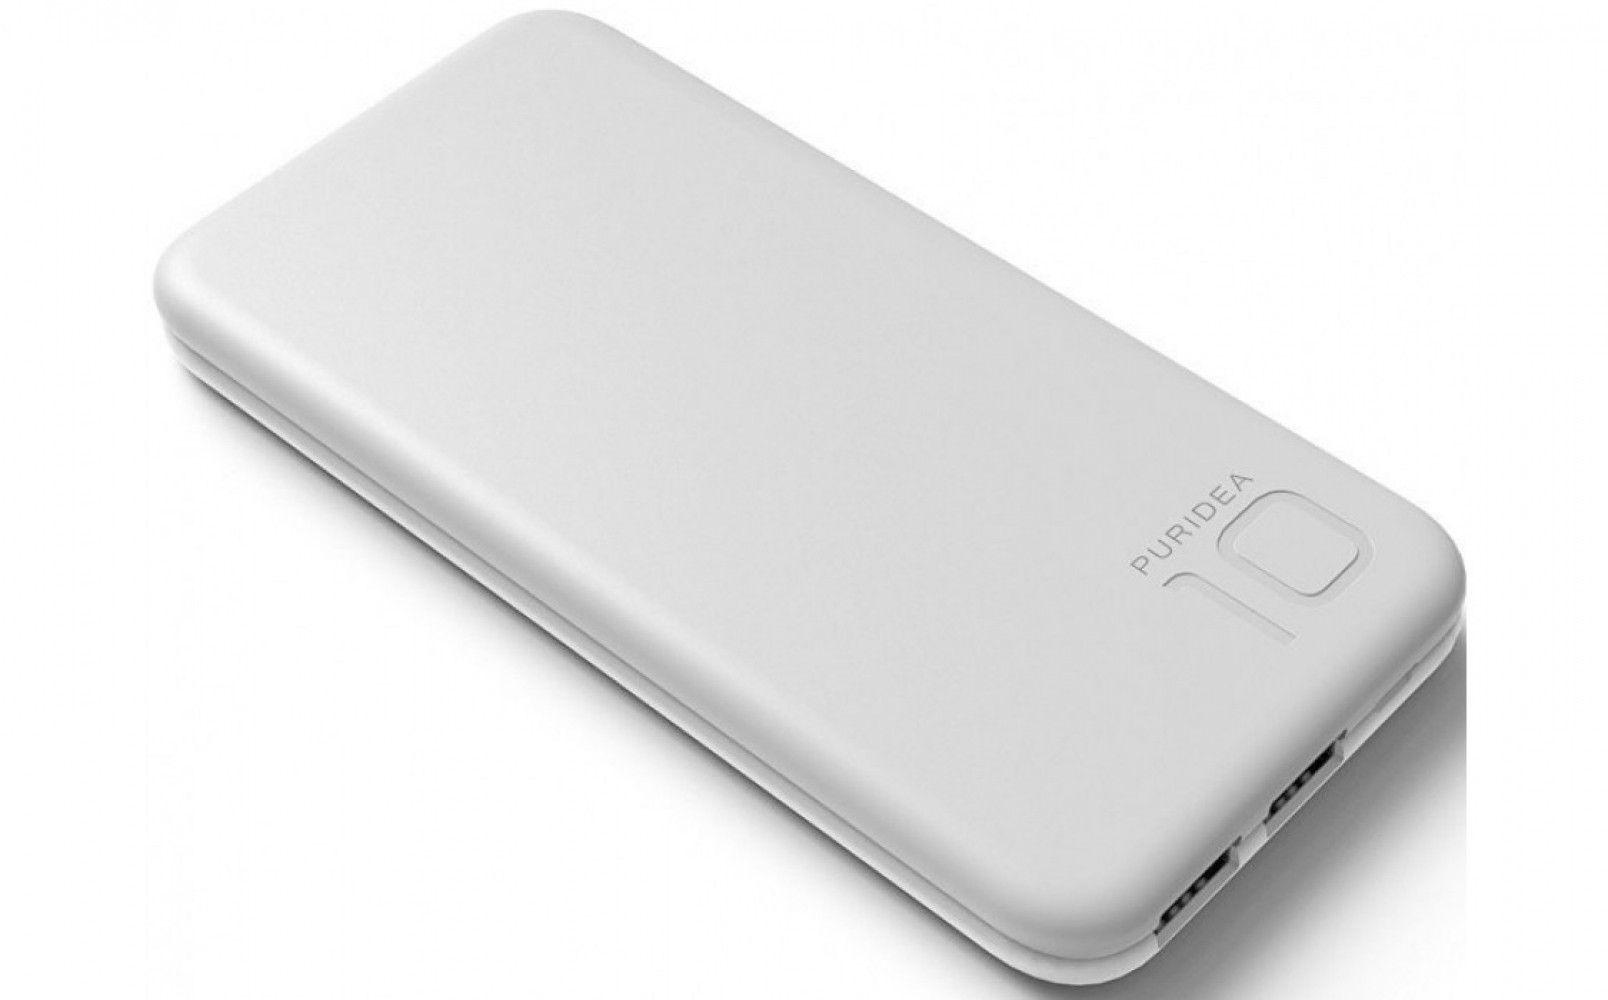 Купить Внешний аккумулятор Puridea S2 10000 mAh Grey/White (S2-Grey White)